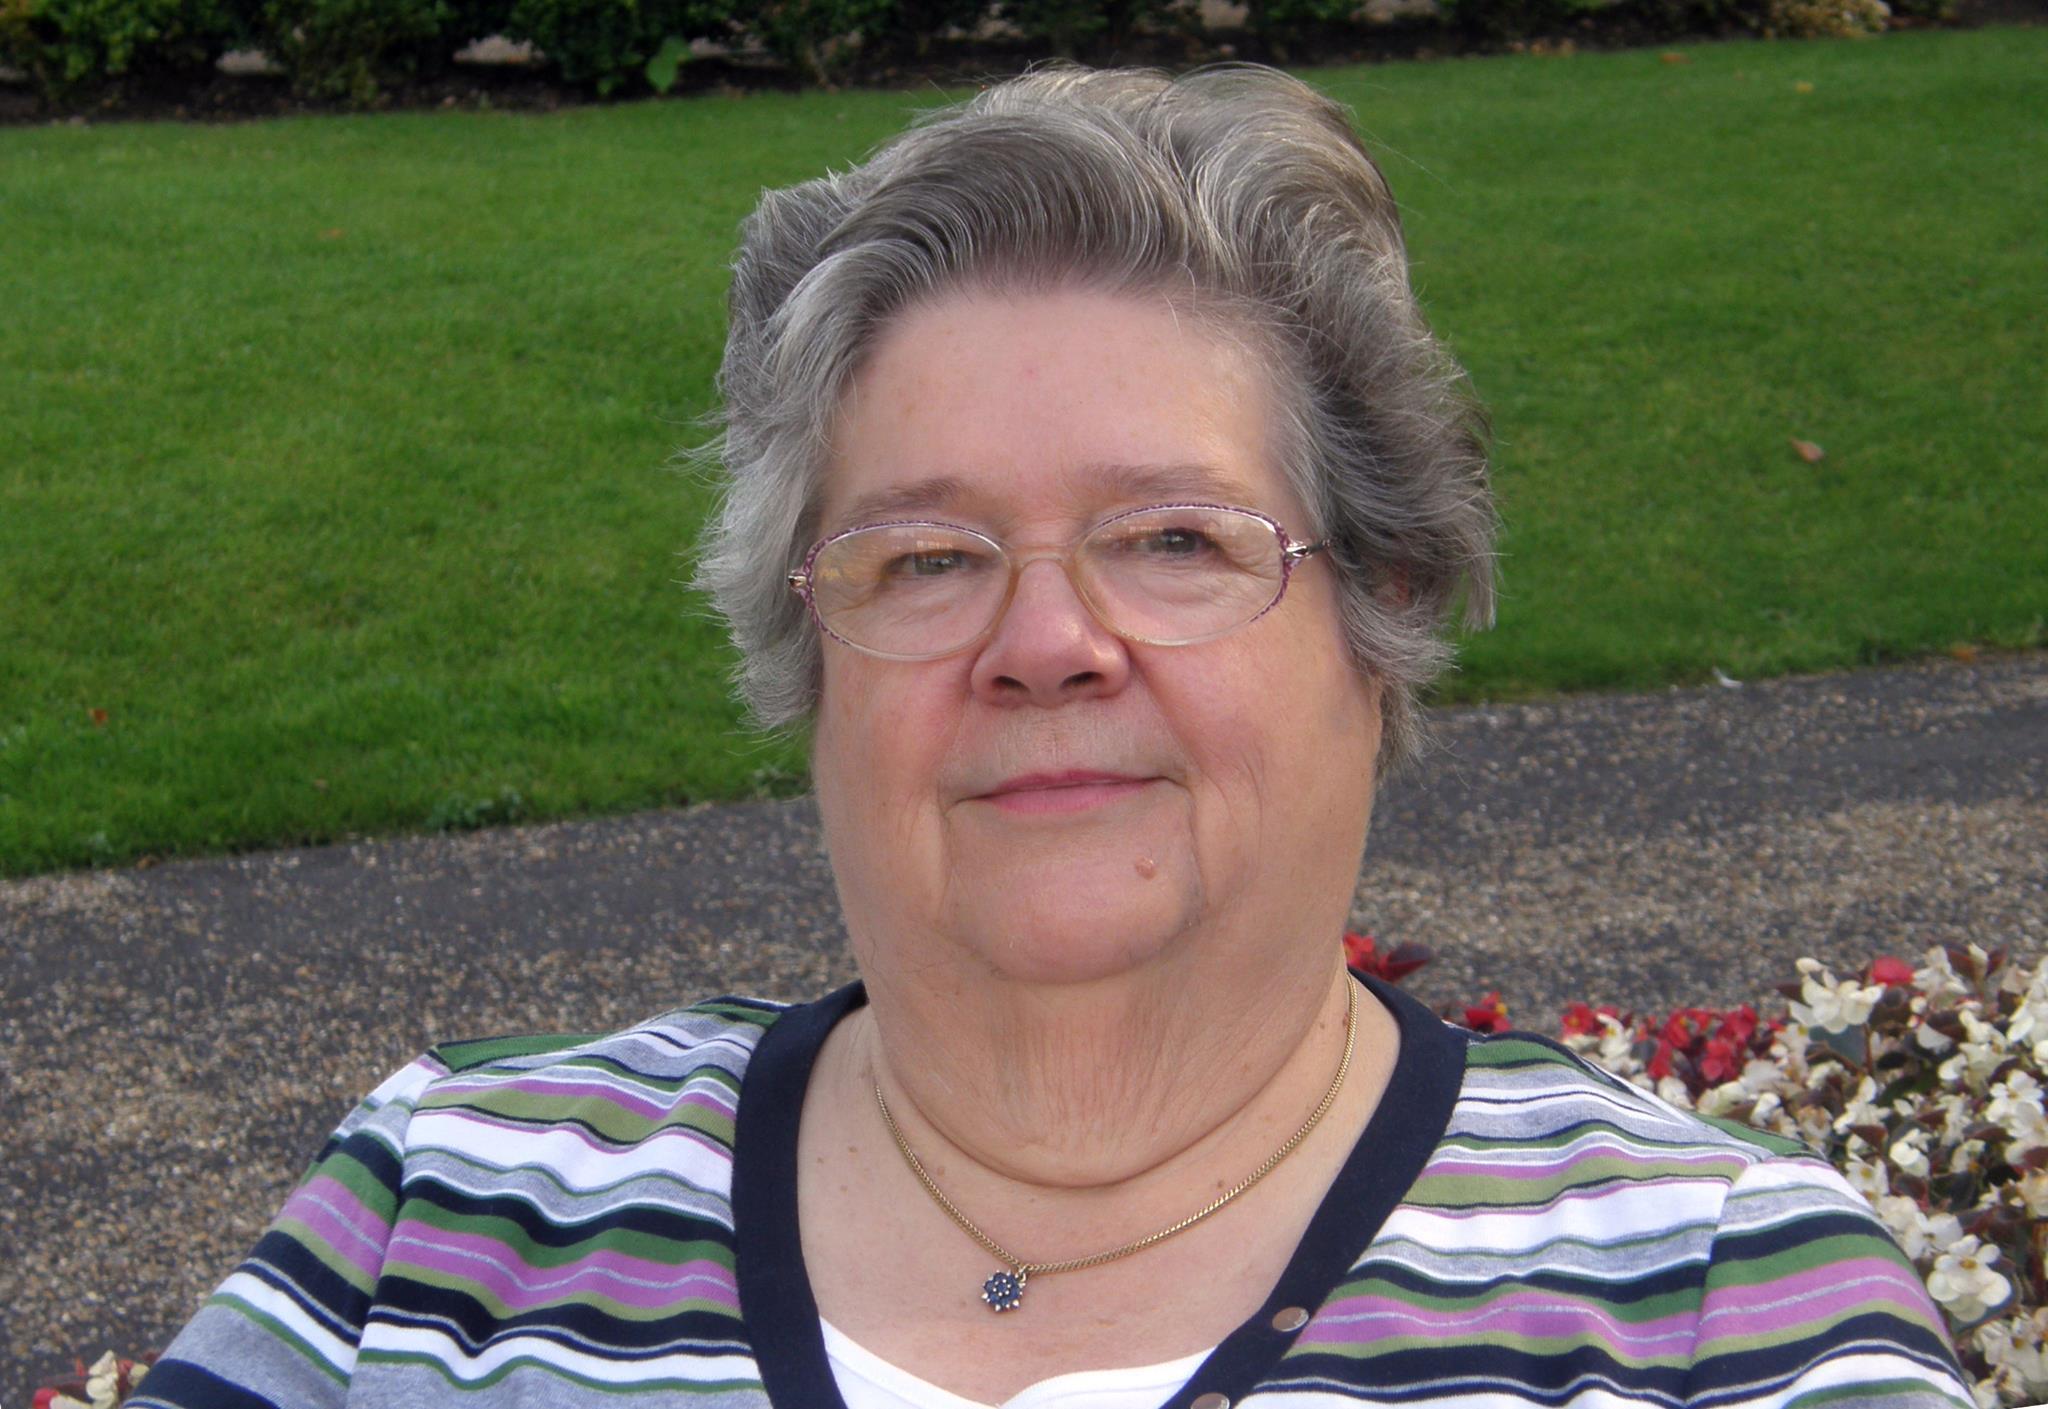 Mary Badham medical misdiagnosis